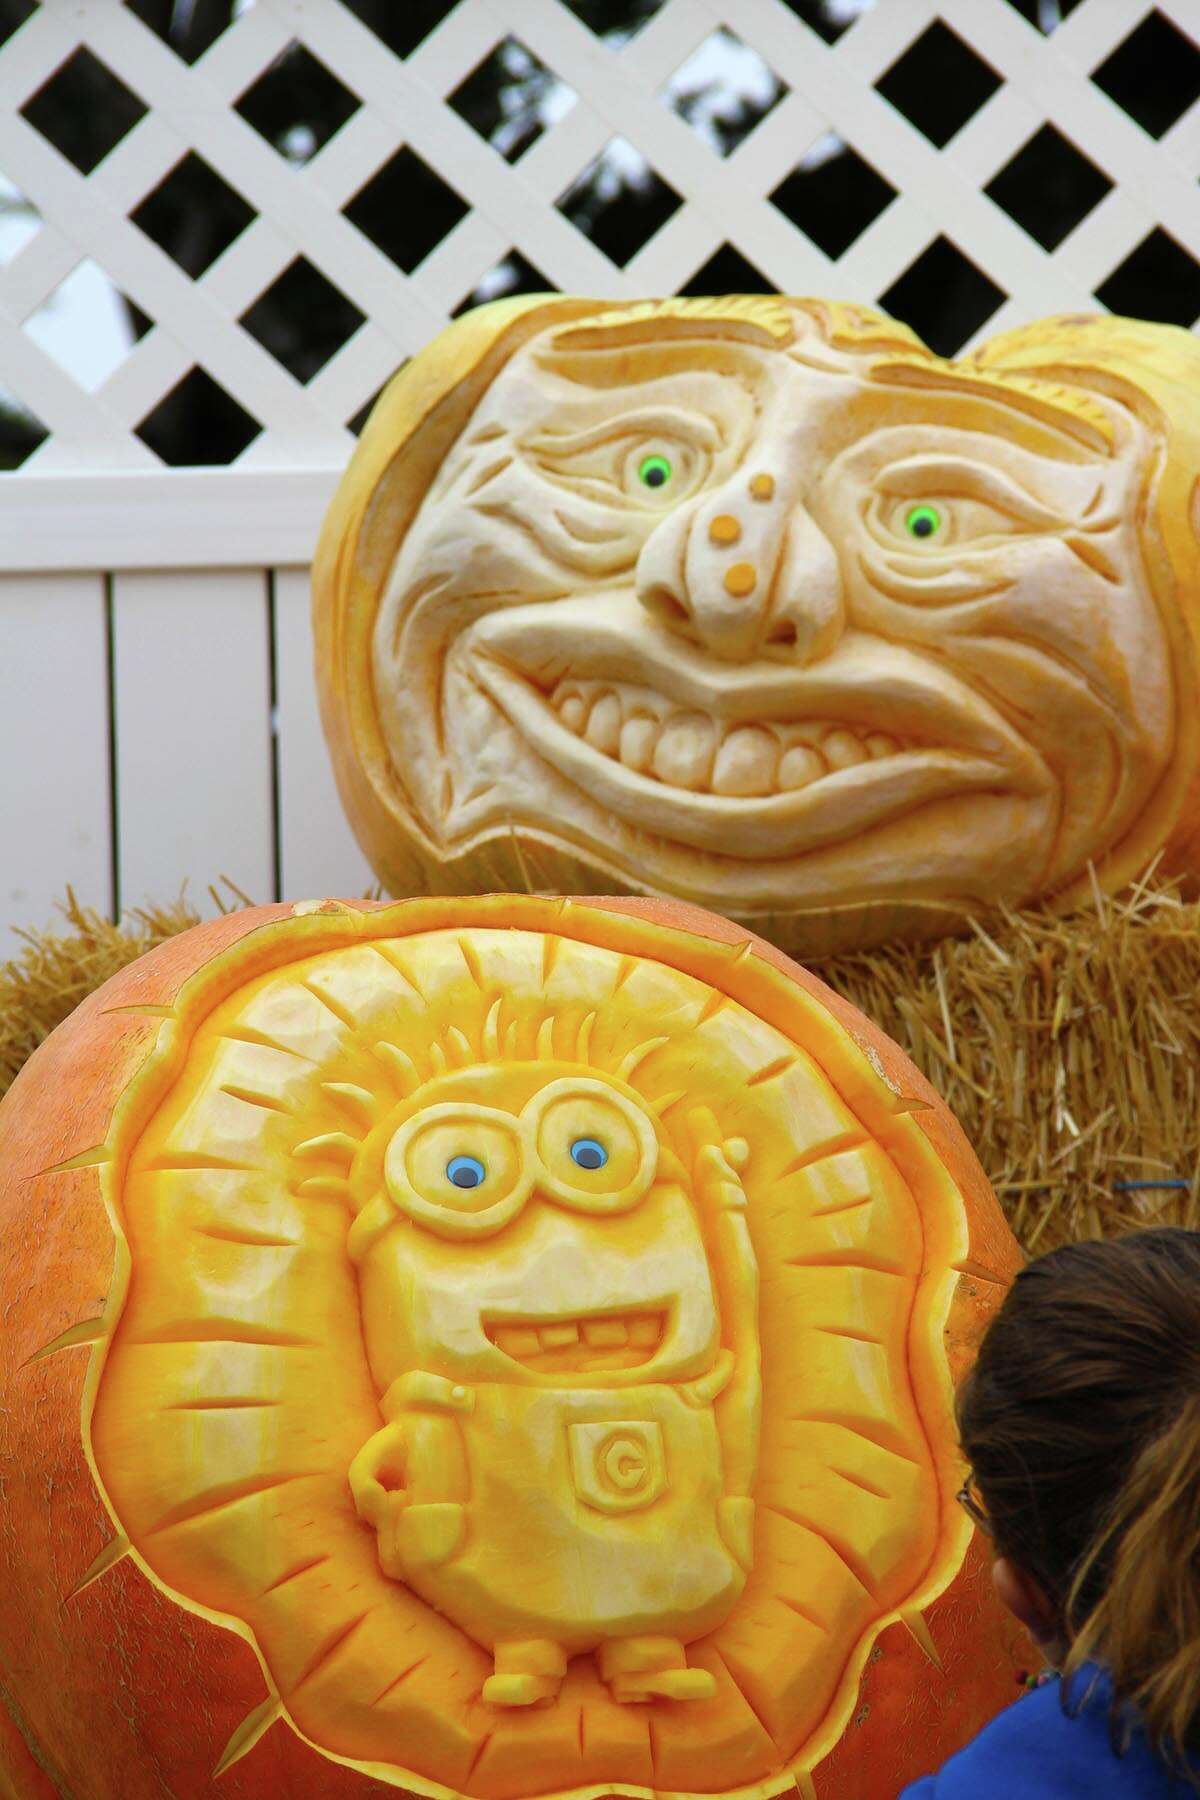 Farmer Mike carves pumpkins at the Half Moon Bay Pumpkin Festival.